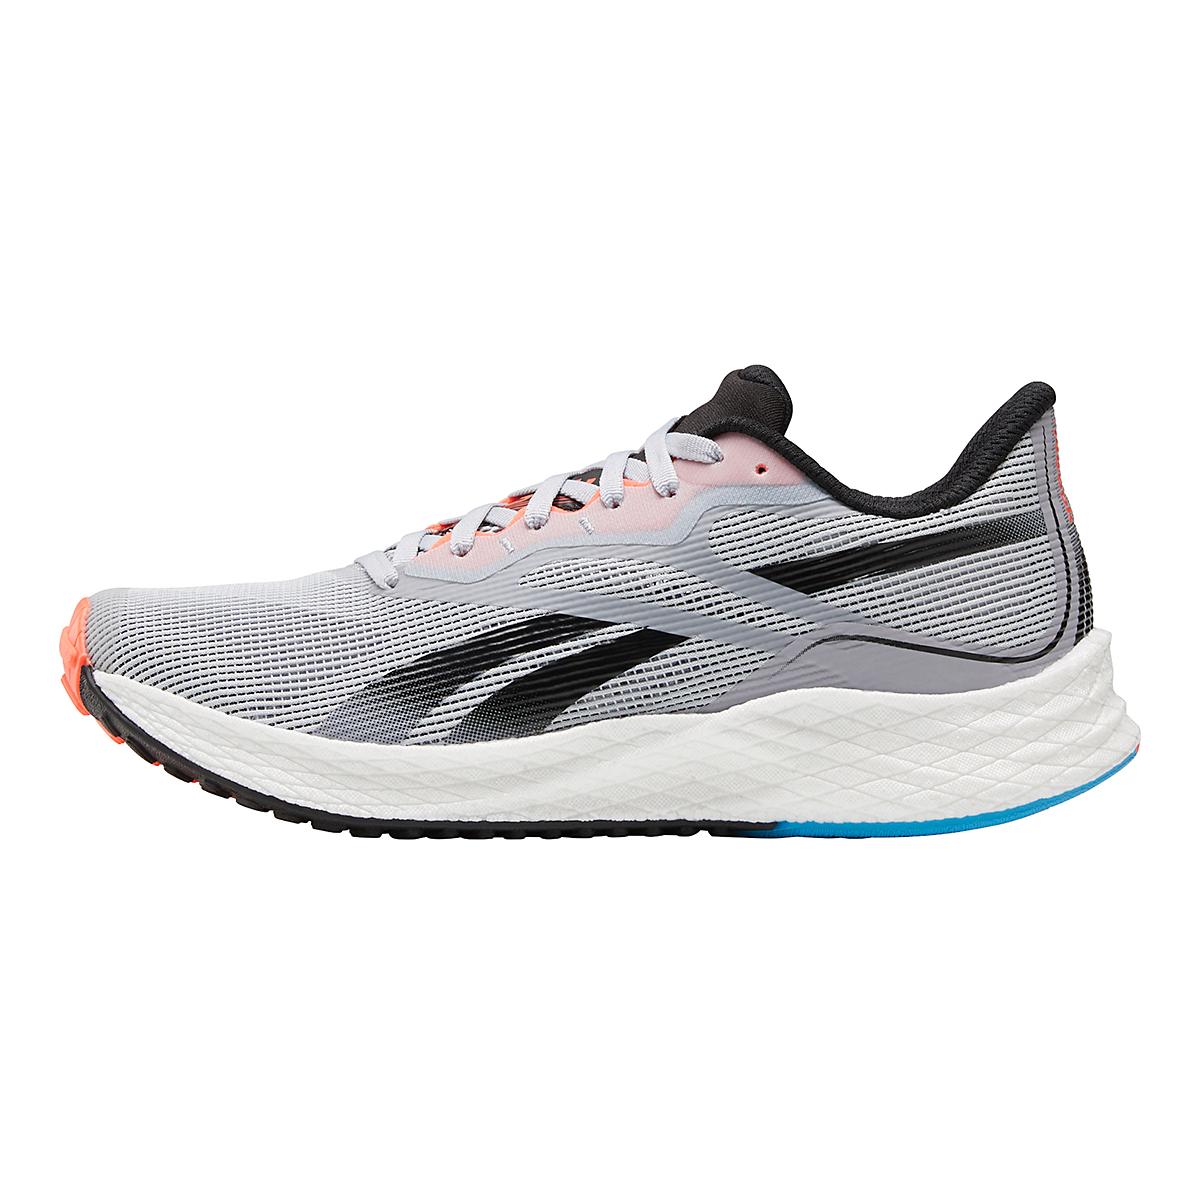 Women's Reebok Floatride Energy 3.0 Running Shoe - Color: Cold Grey/Core Black/Orange Flare - Size: 5 - Width: Regular, Cold Grey/Core Black/Orange Flare, large, image 2